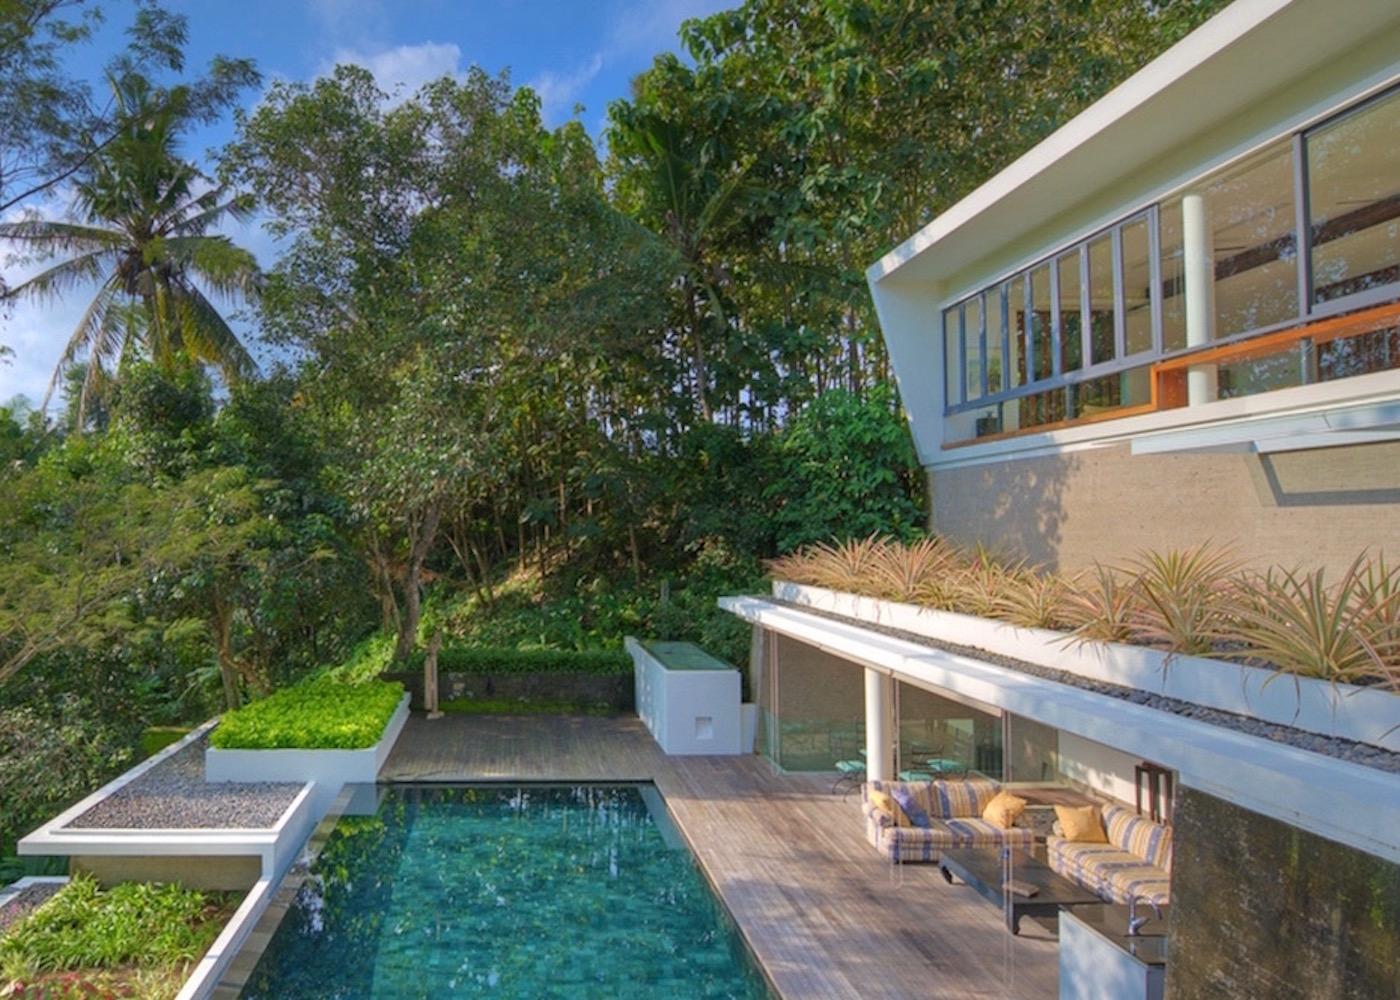 design villas in Bali - villa ngomfi